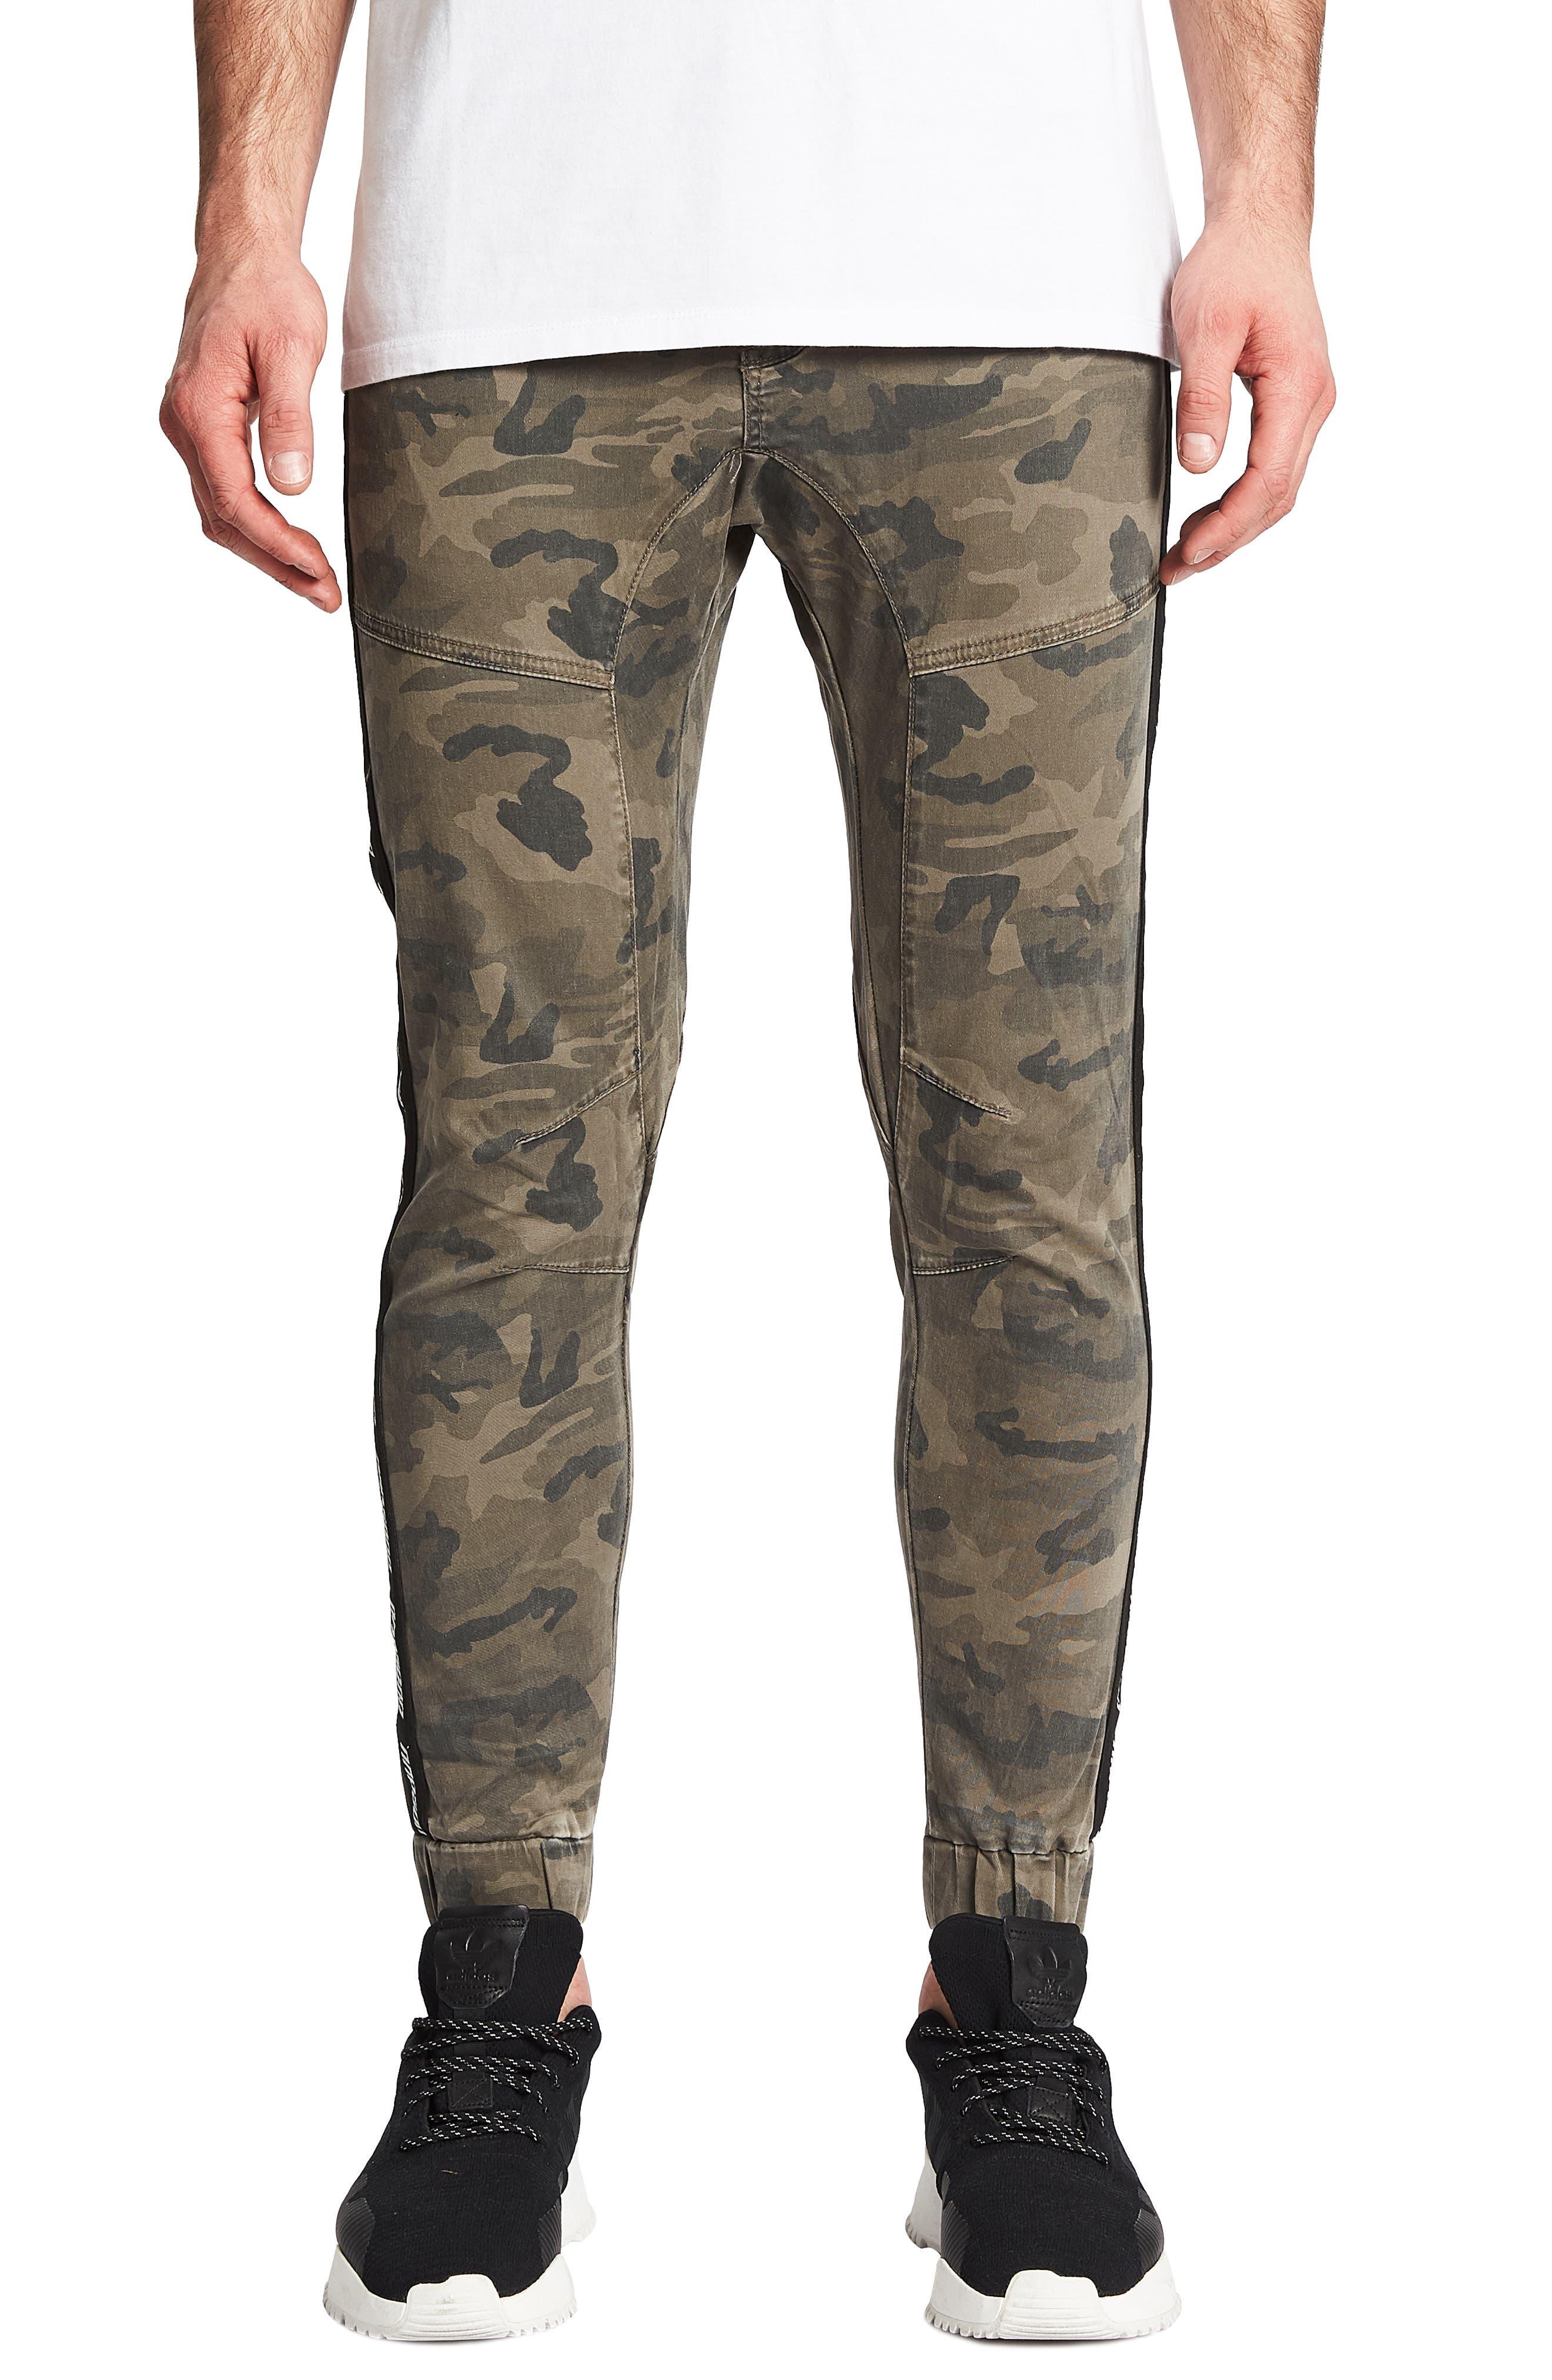 Firebrand Slim Fit Pants,                         Main,                         color, AIRWOLF CAMO